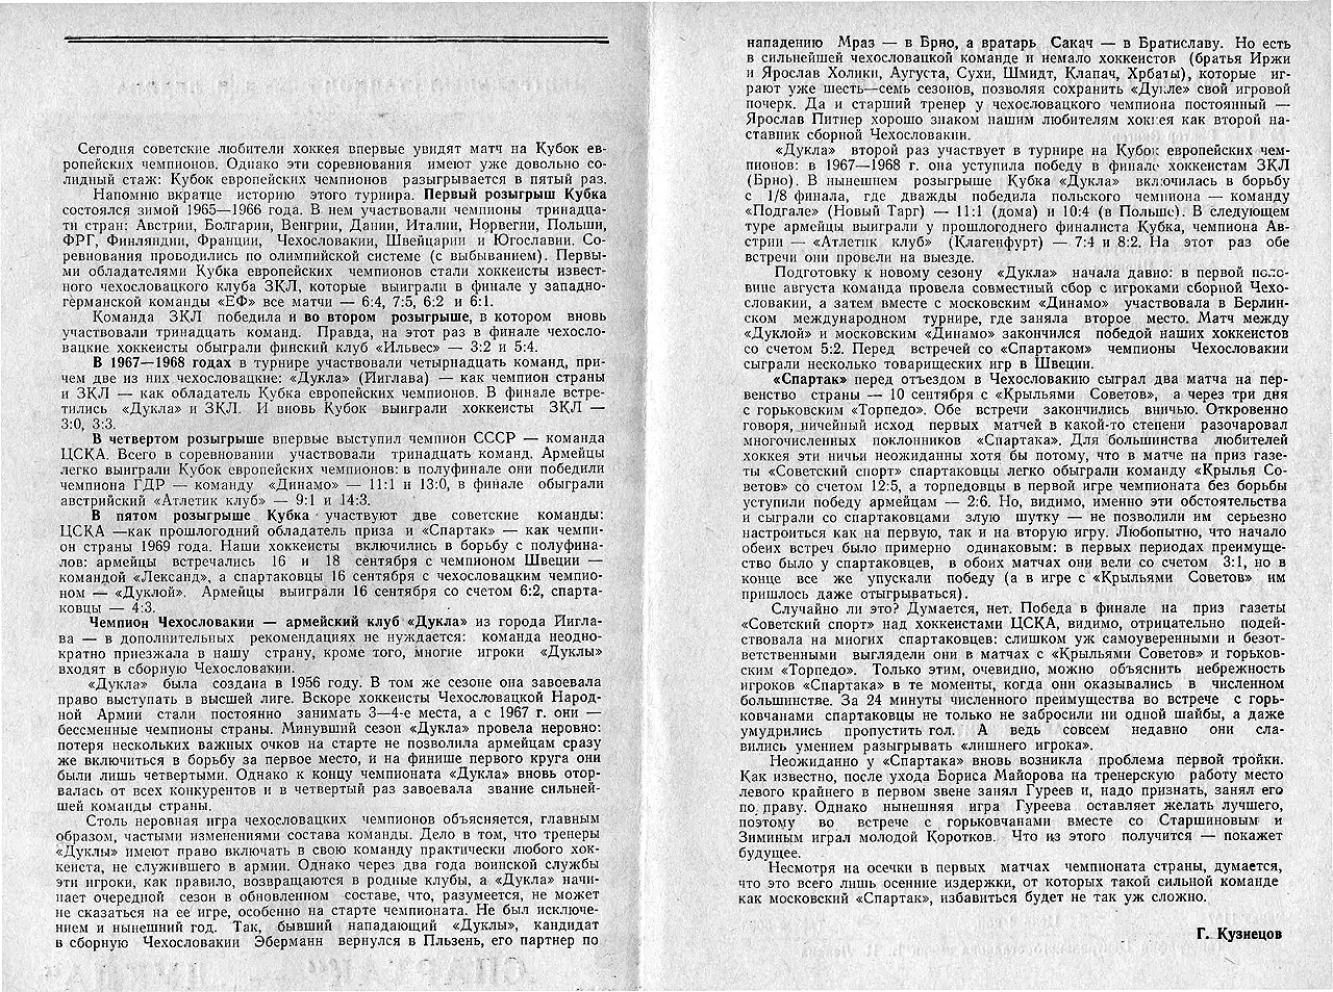 1970.09.19. Спартак - Дукла, Йиглава (ЧССР) (Кб. ЕЧ, 1`2 фин.)_02.png